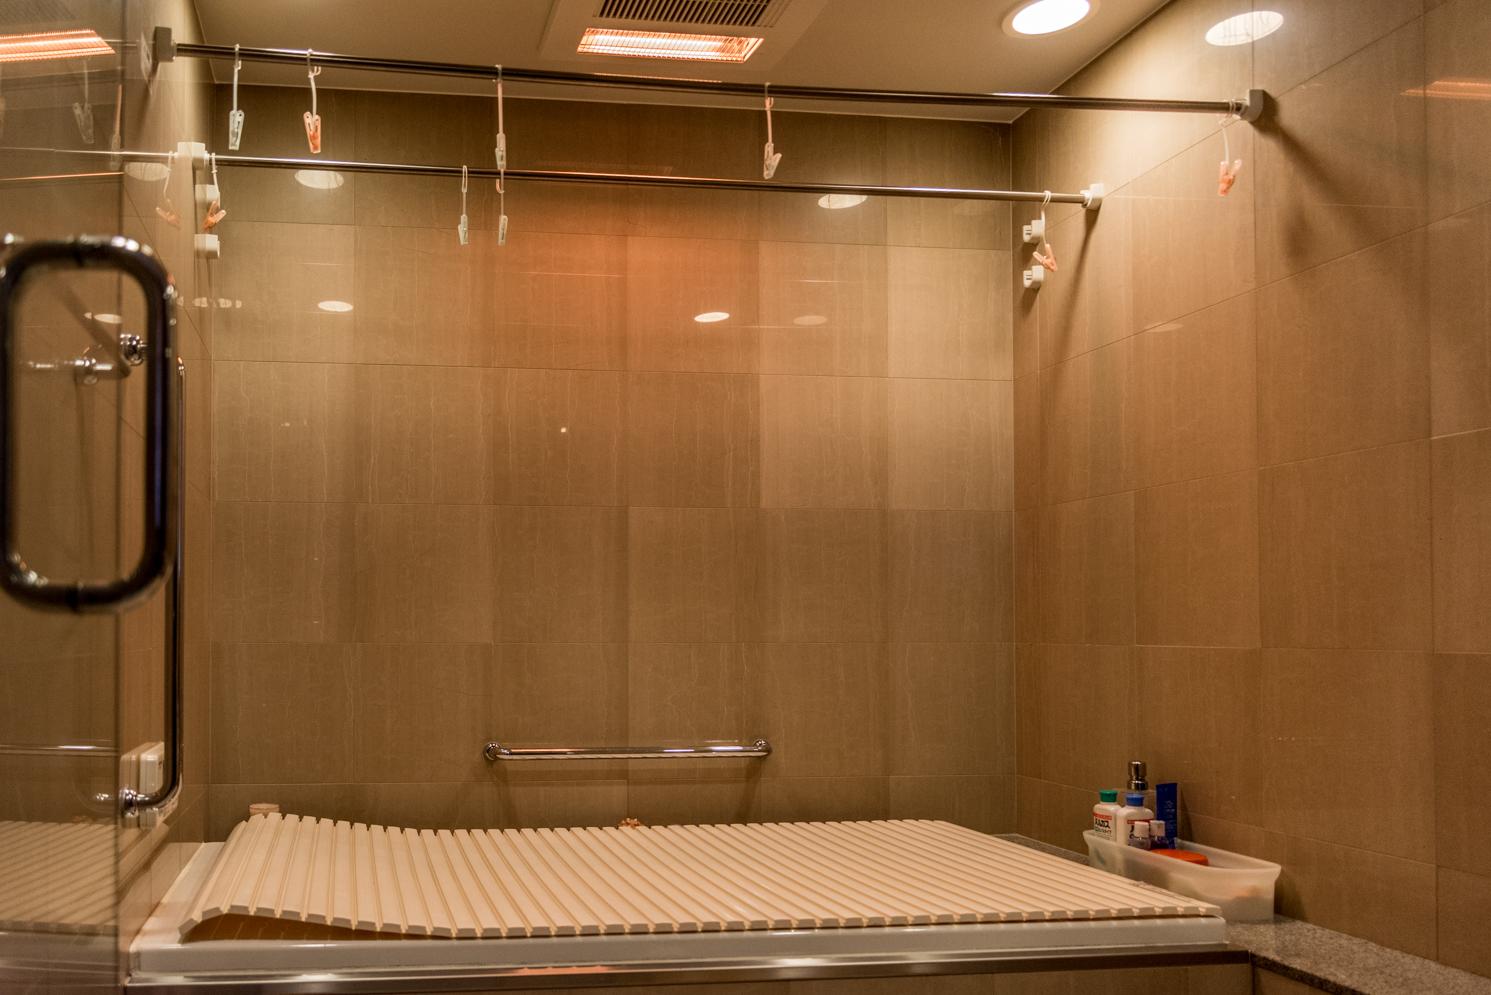 ROCK MAMA NYC LIFESTYLE BLOG - OFURO JAPANESE BATH